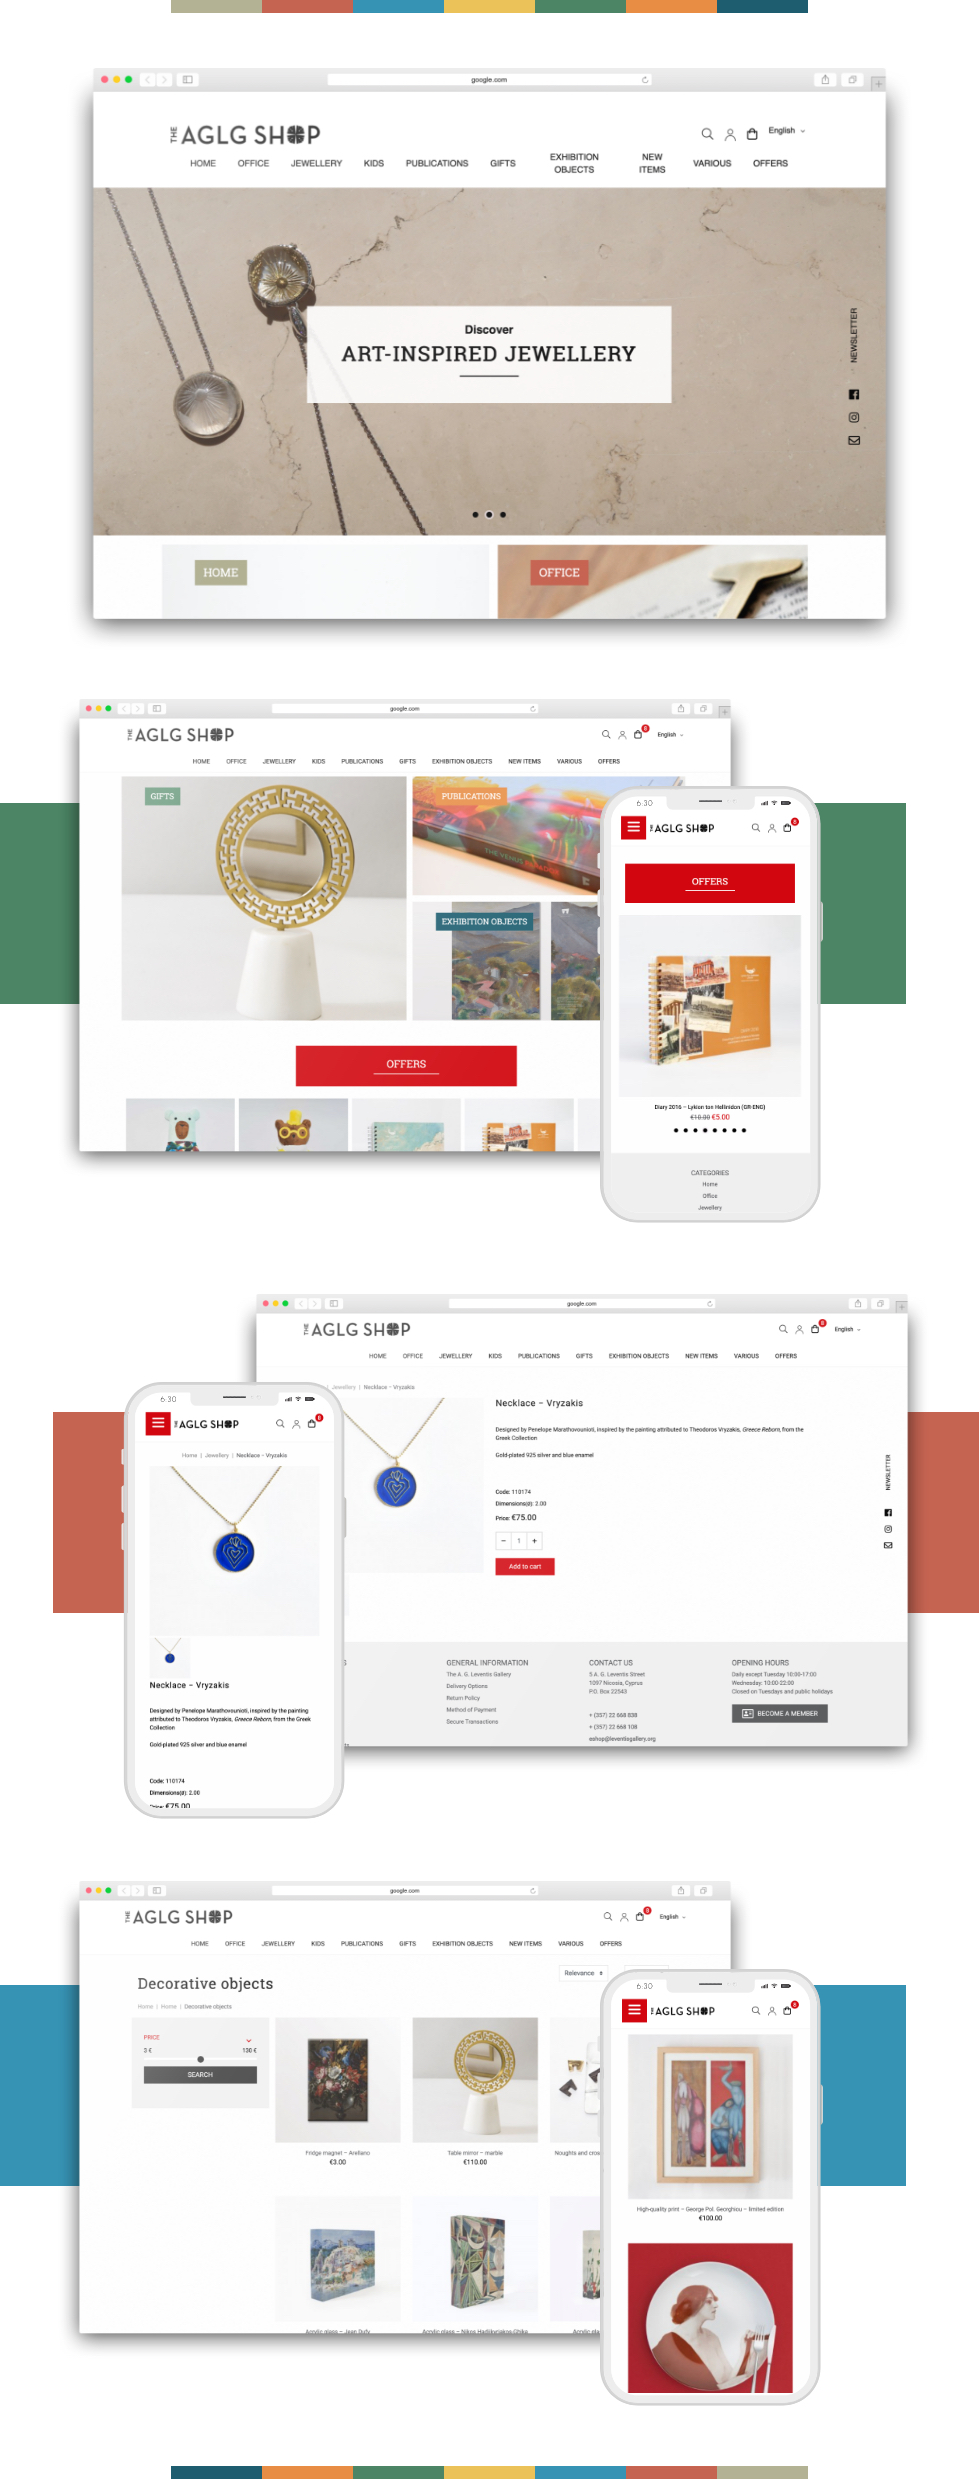 The AGLG Shop Website